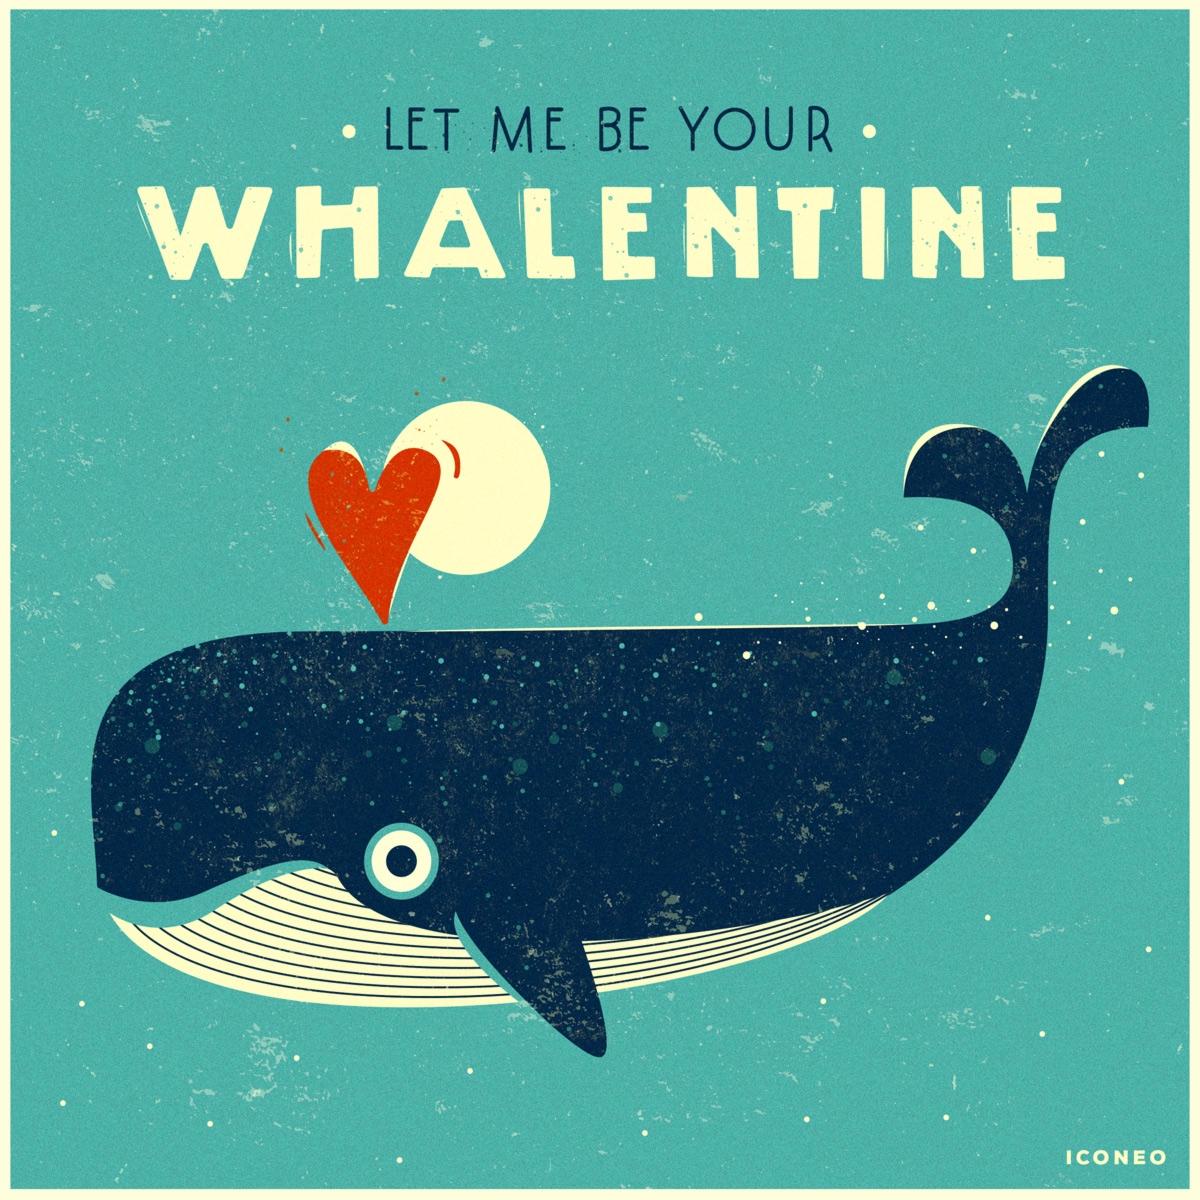 le whalentine - valentinesday, happyvalentinesday - iconeo | ello